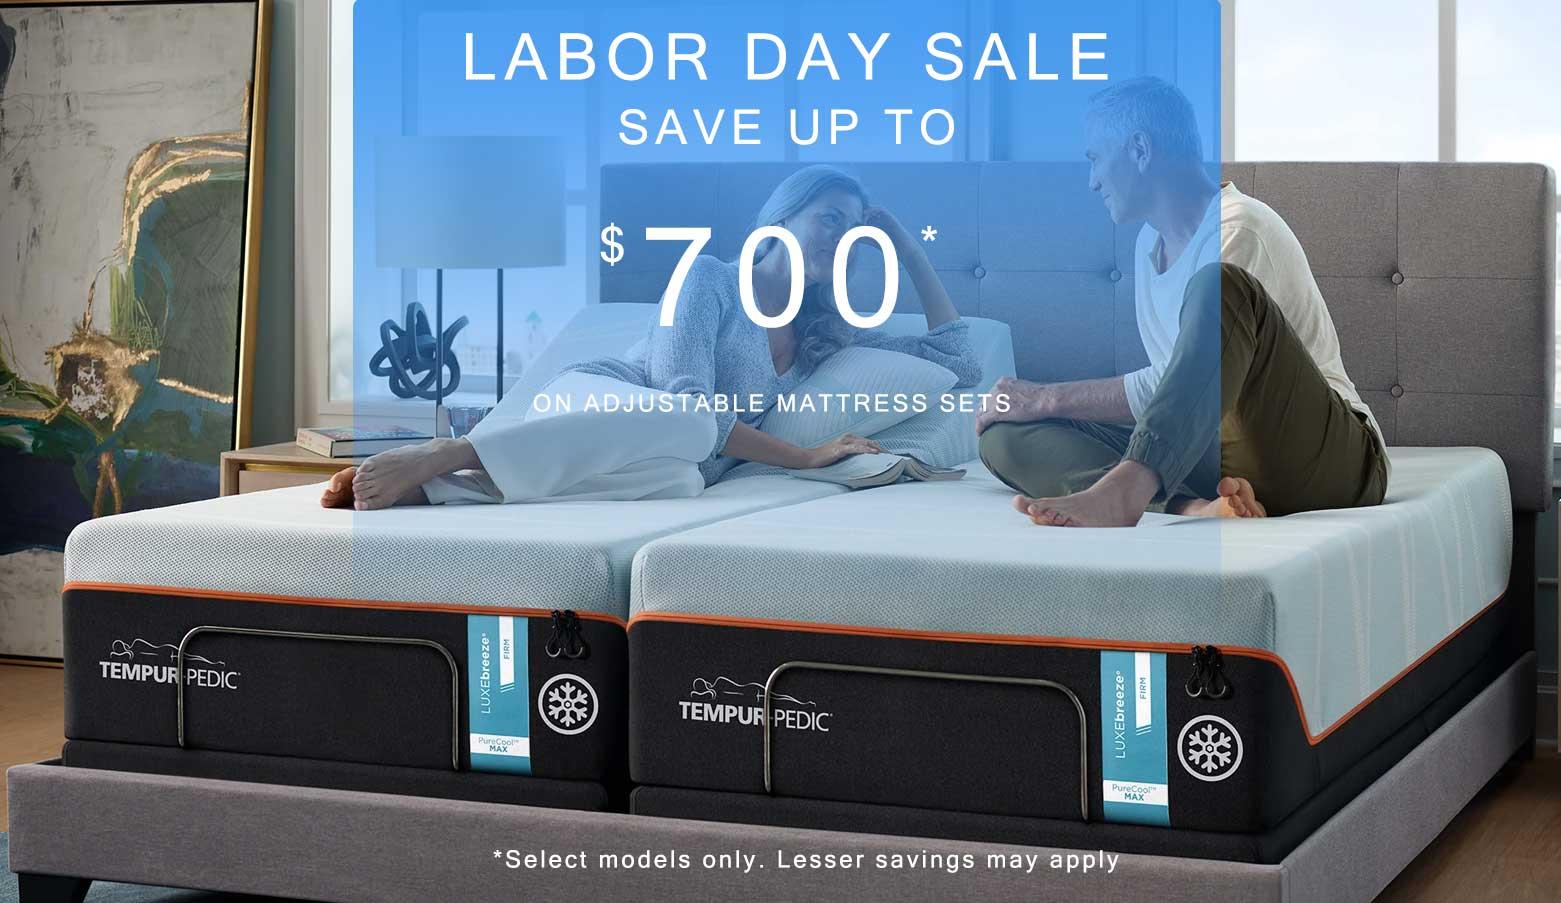 Save $700 On select Tempur-pedic Mattress sets